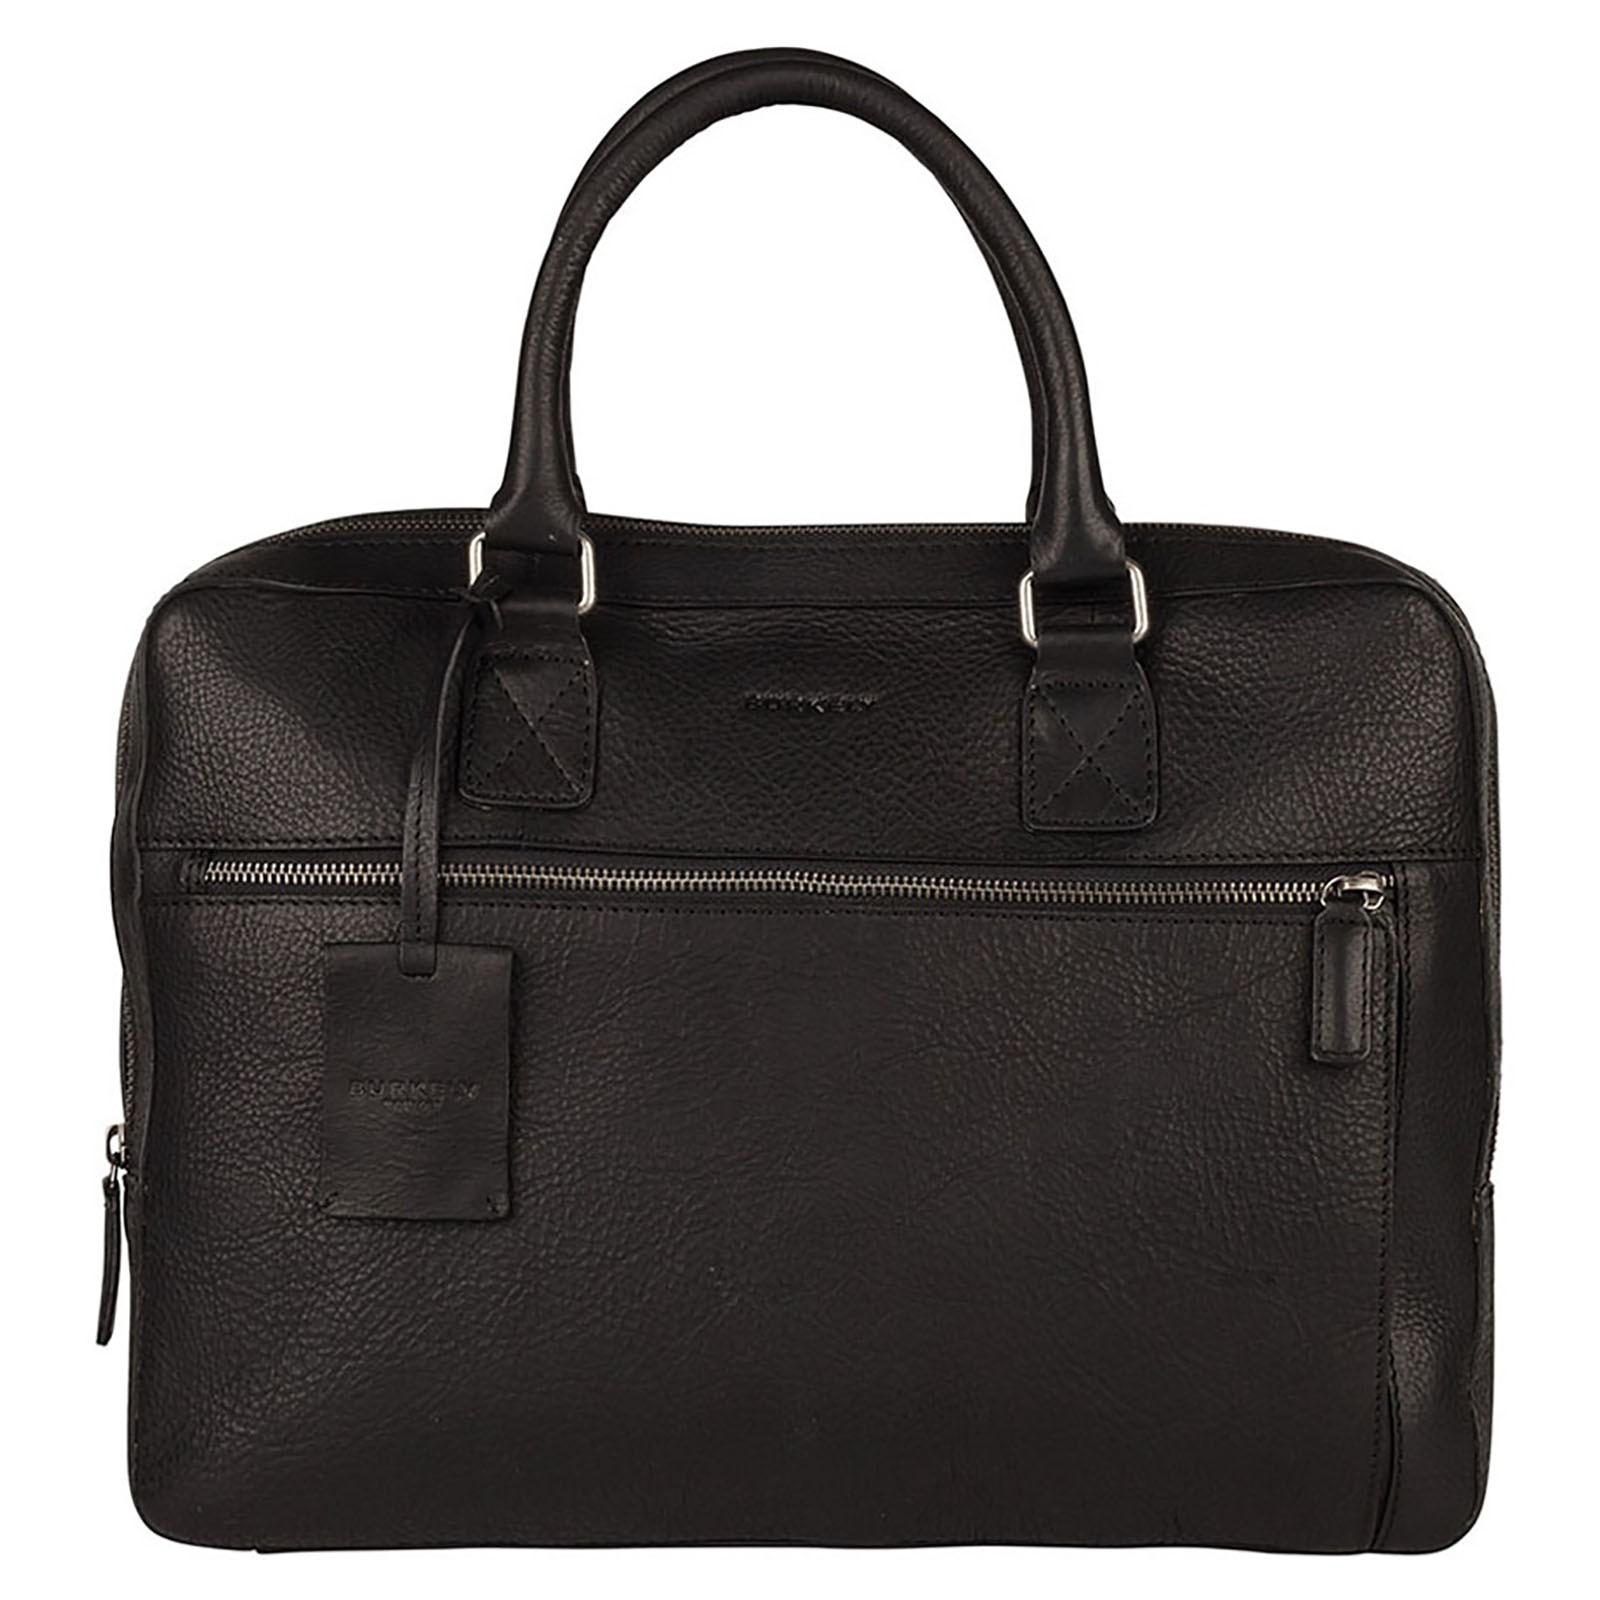 Pánska kožená taška na notebook Burkely Laptop - čierna